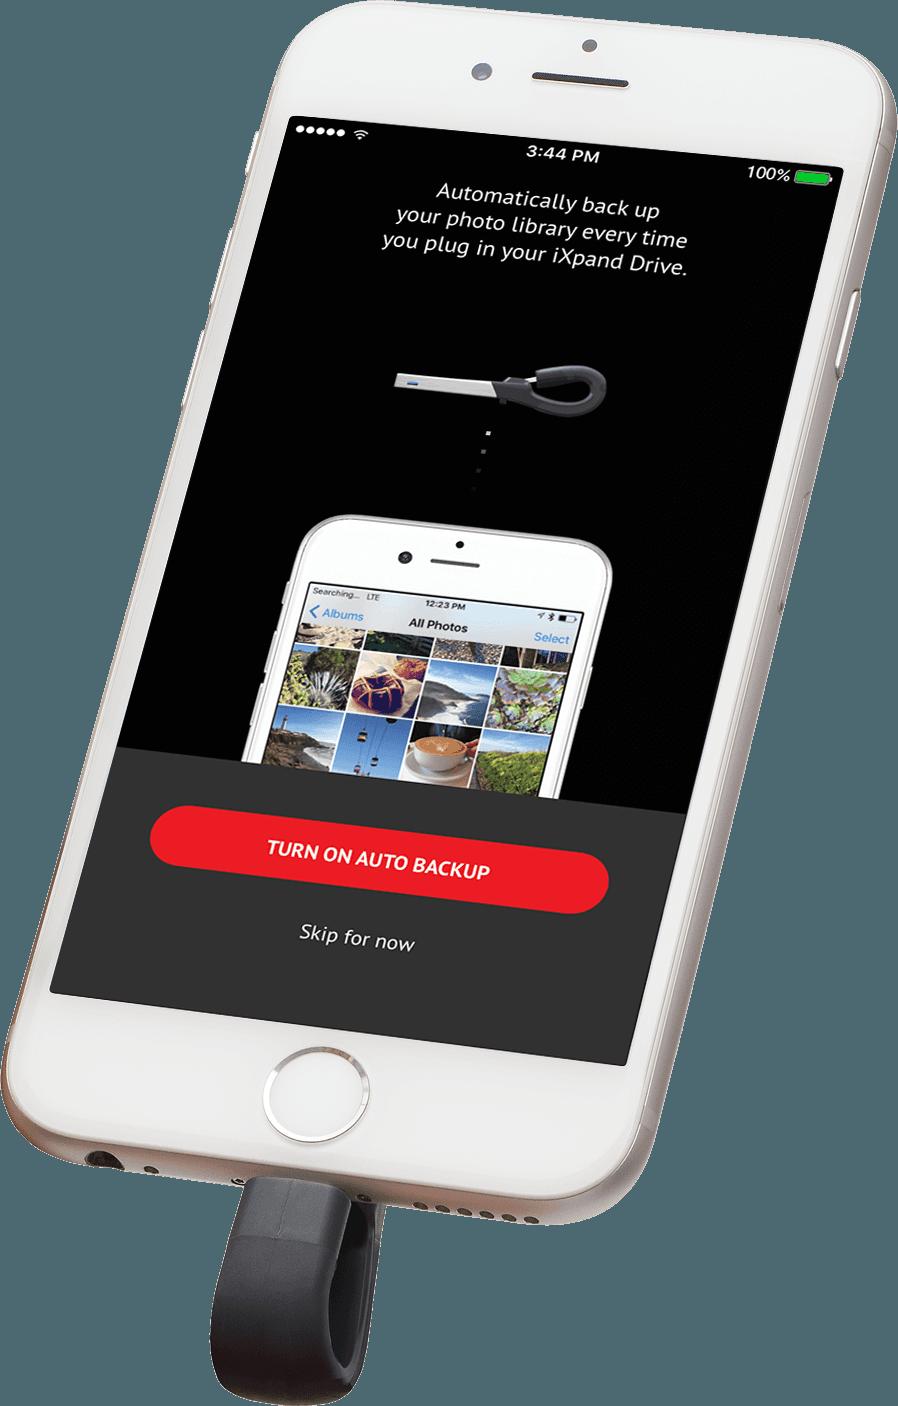 sandisk ixpand flash drive for iphone. Black Bedroom Furniture Sets. Home Design Ideas